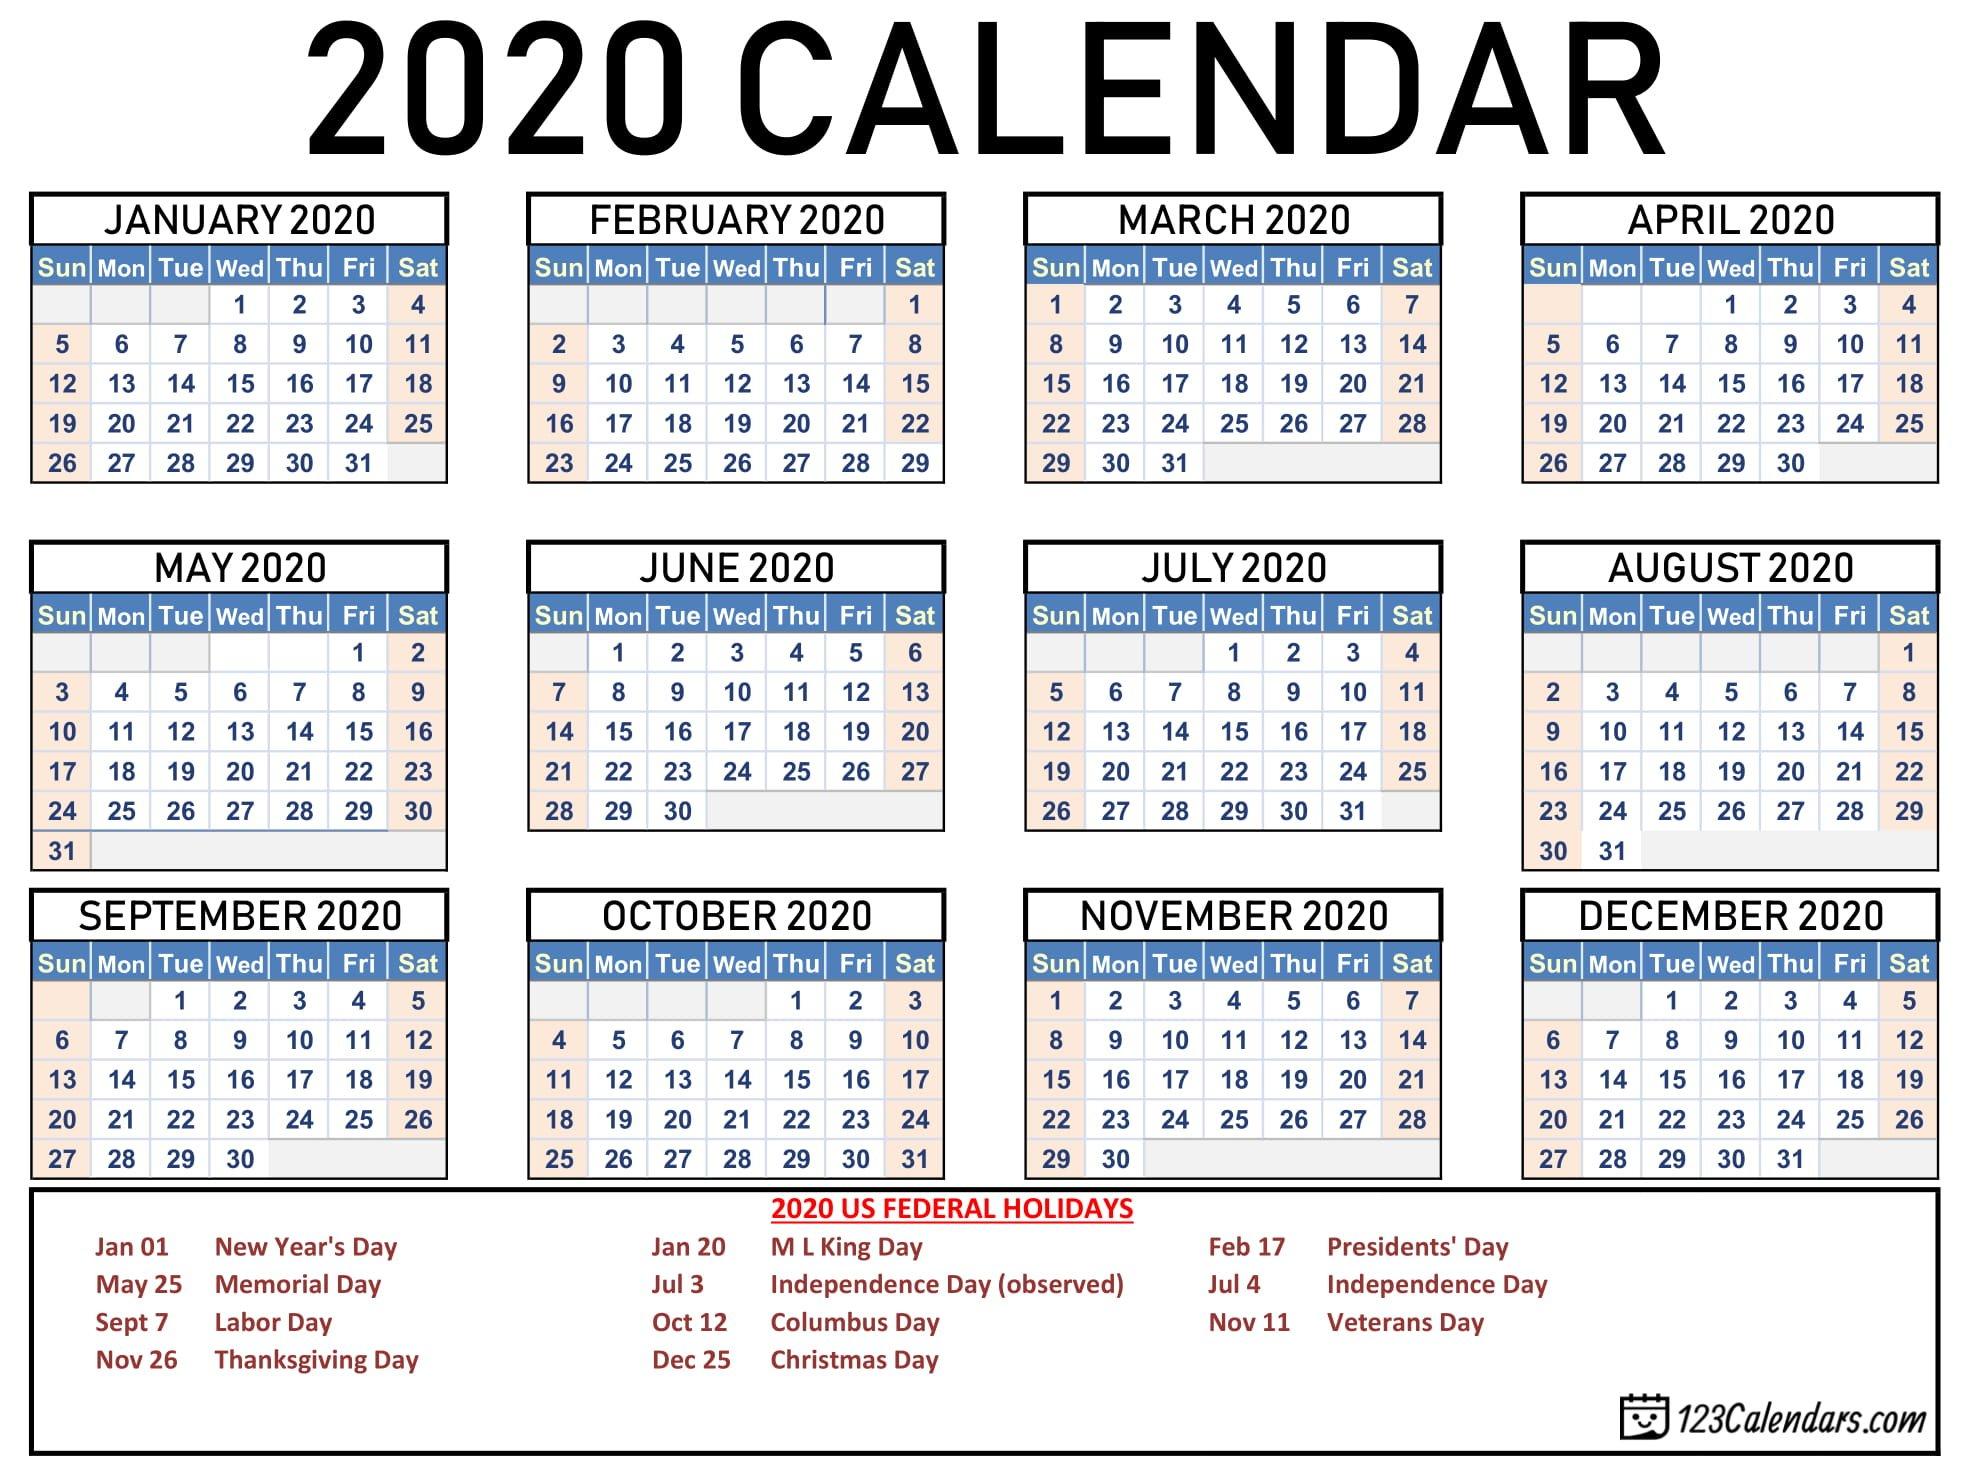 2021 Printable Calendar   123Calendars Blank 30 Day Calendar Starting May 24